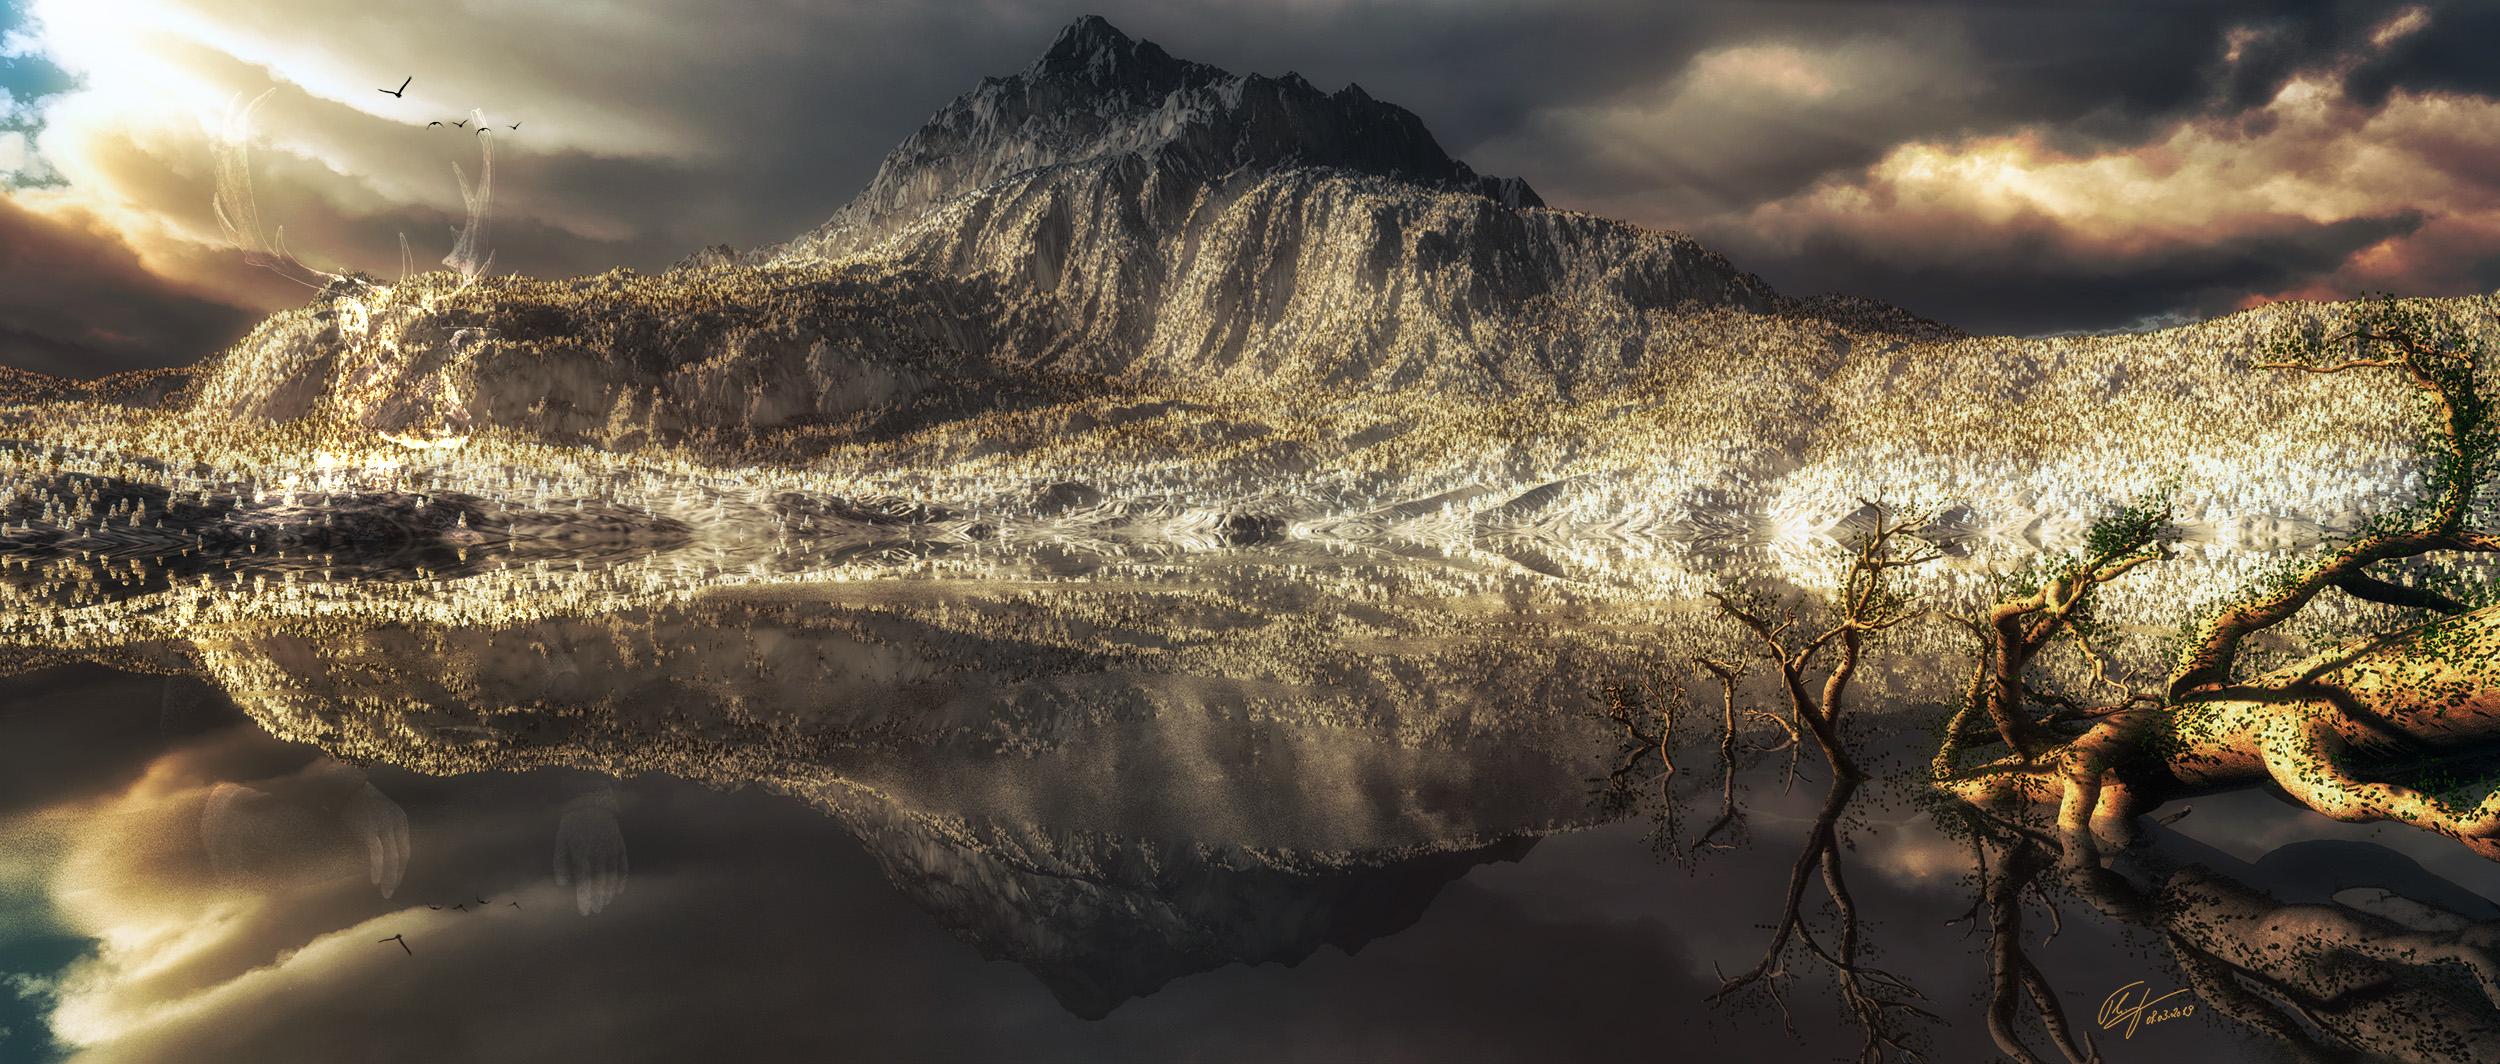 MWD 91; Landscape; Mountain; Water; Sea; Mountainlake; Dark Clouds